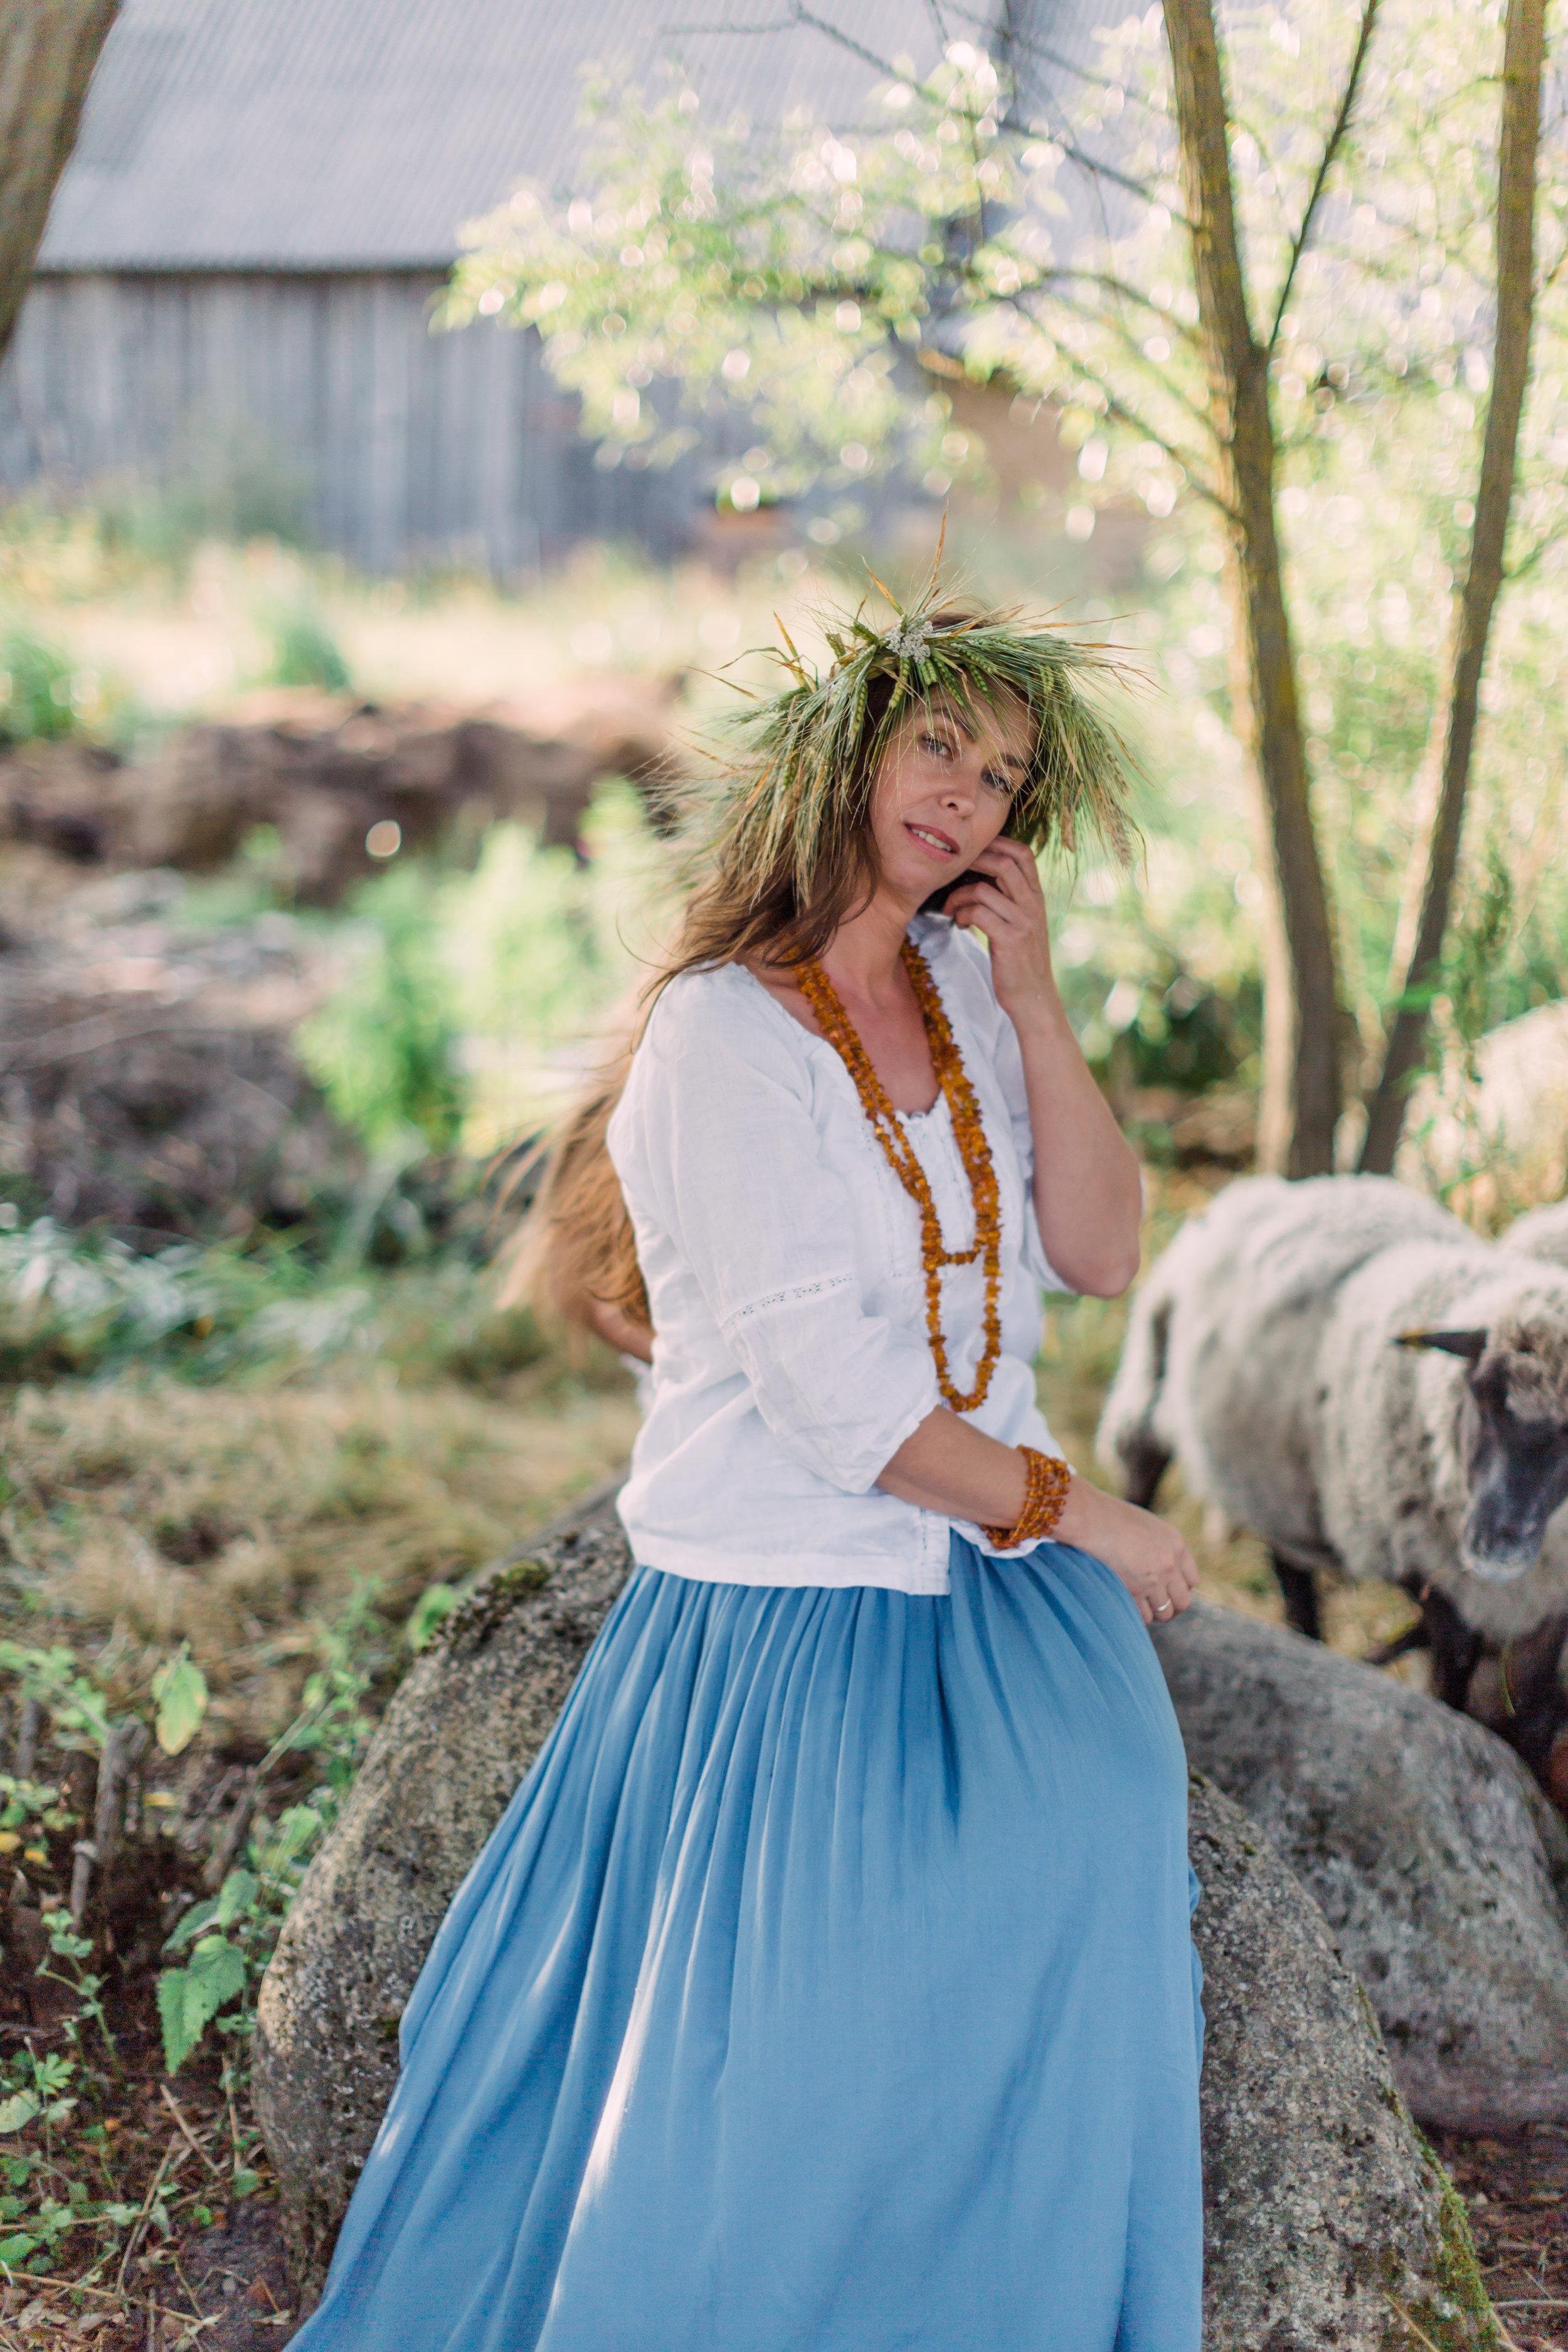 Vitalija Birbaliene - Farm Editorial Photo Session_Fine Art Photography_Lithuania_London_UK_2018_Joana Senkute Photography